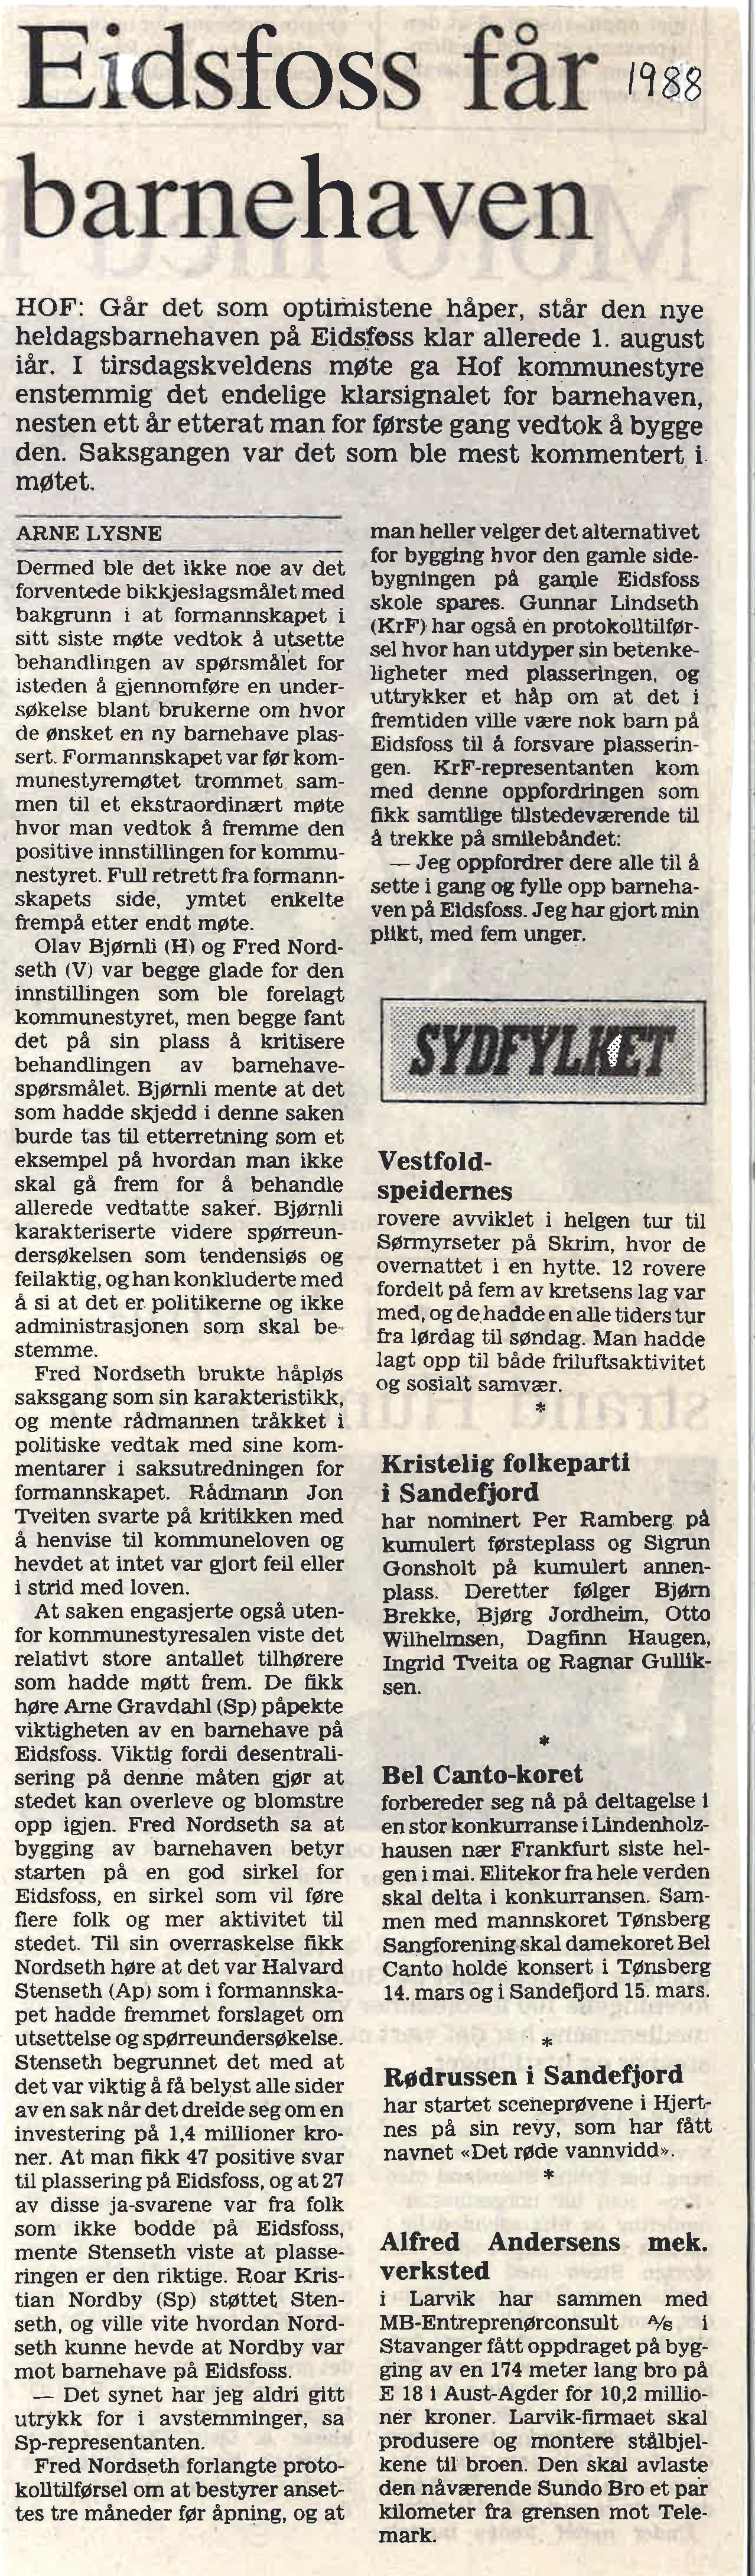 Tønsbergs Blad 1988